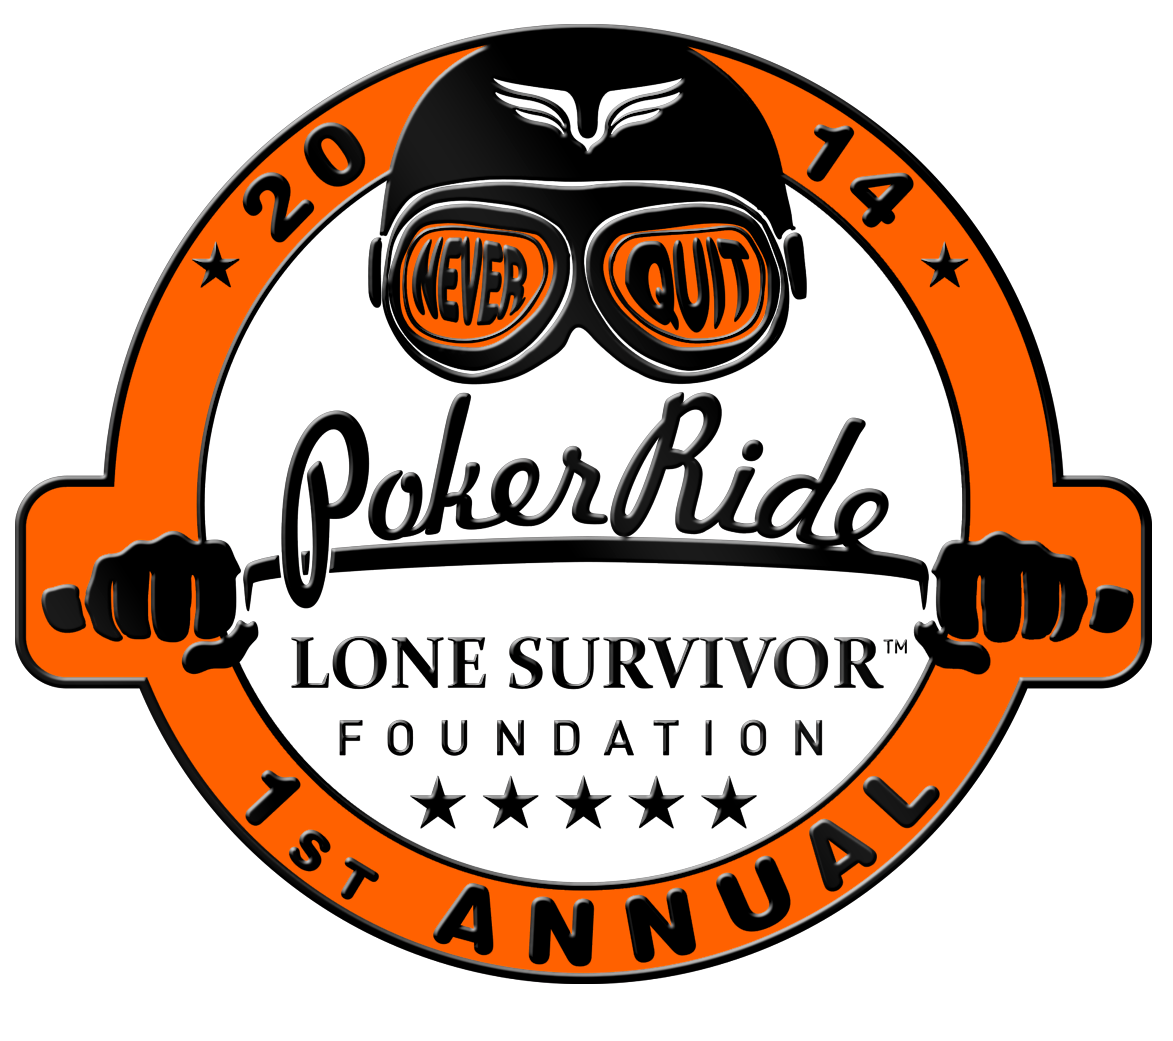 poker ride lone survivor annual custom pins.png